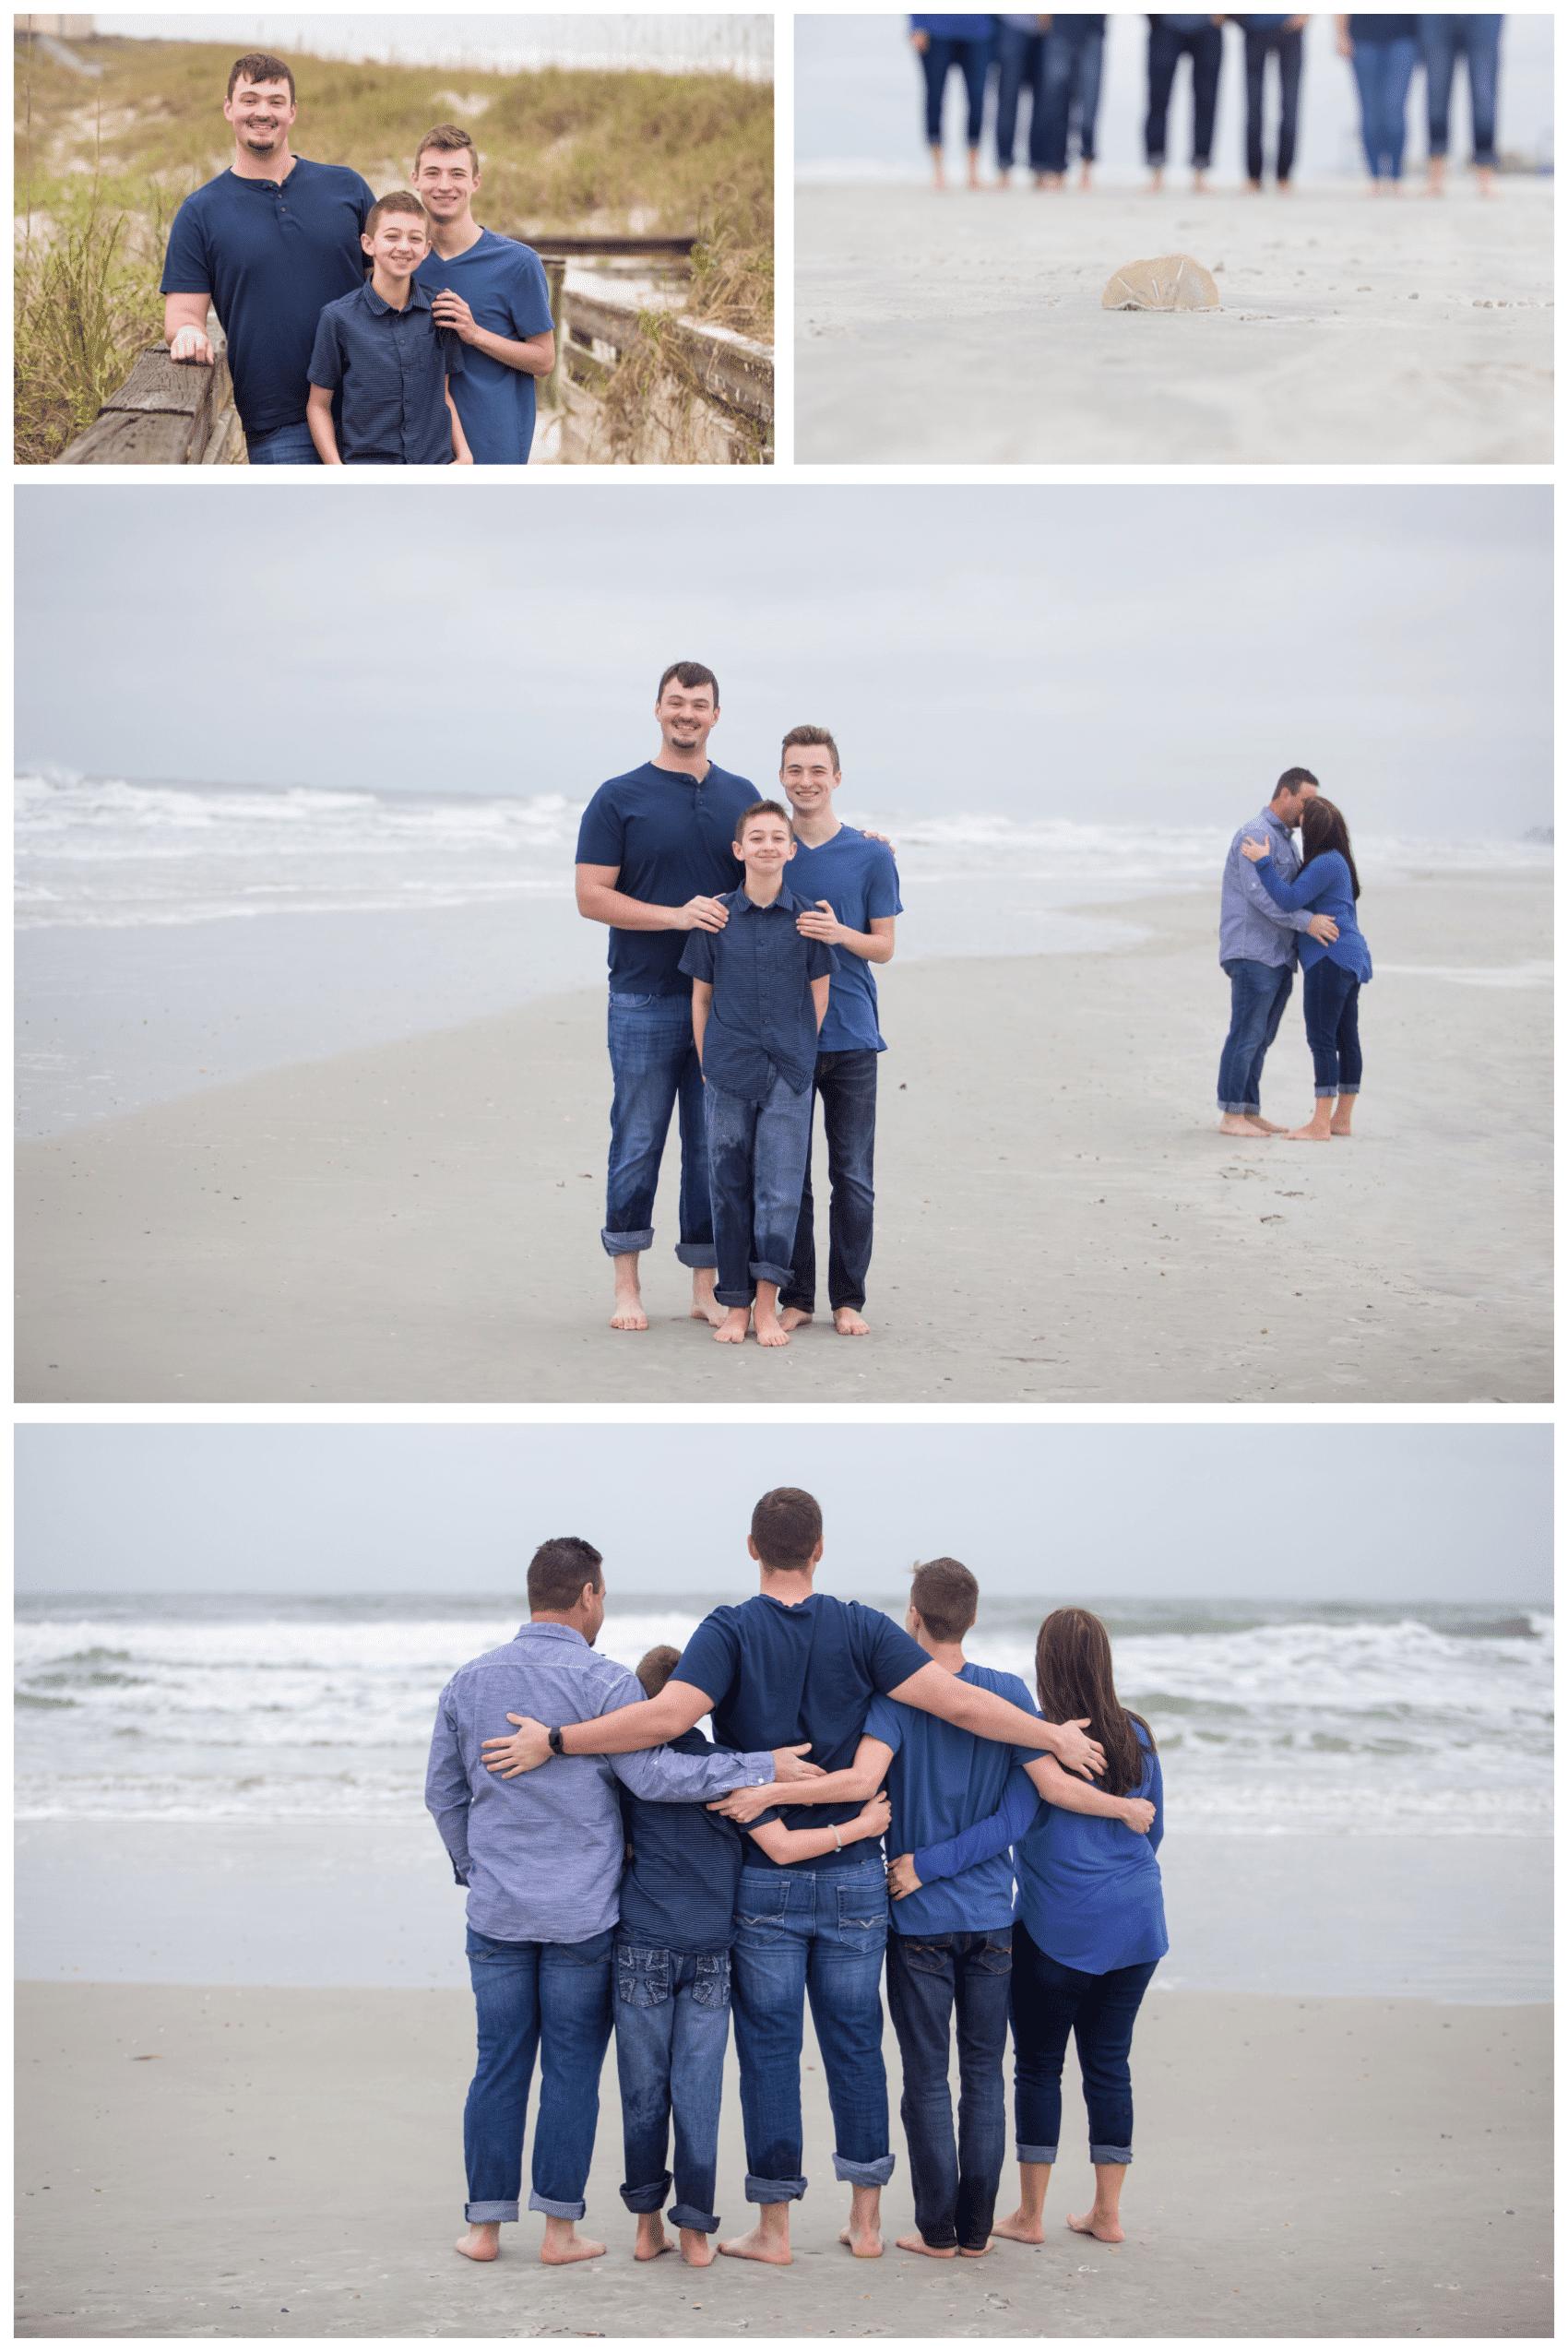 Jacksonville beach family photos by Hinson Photography